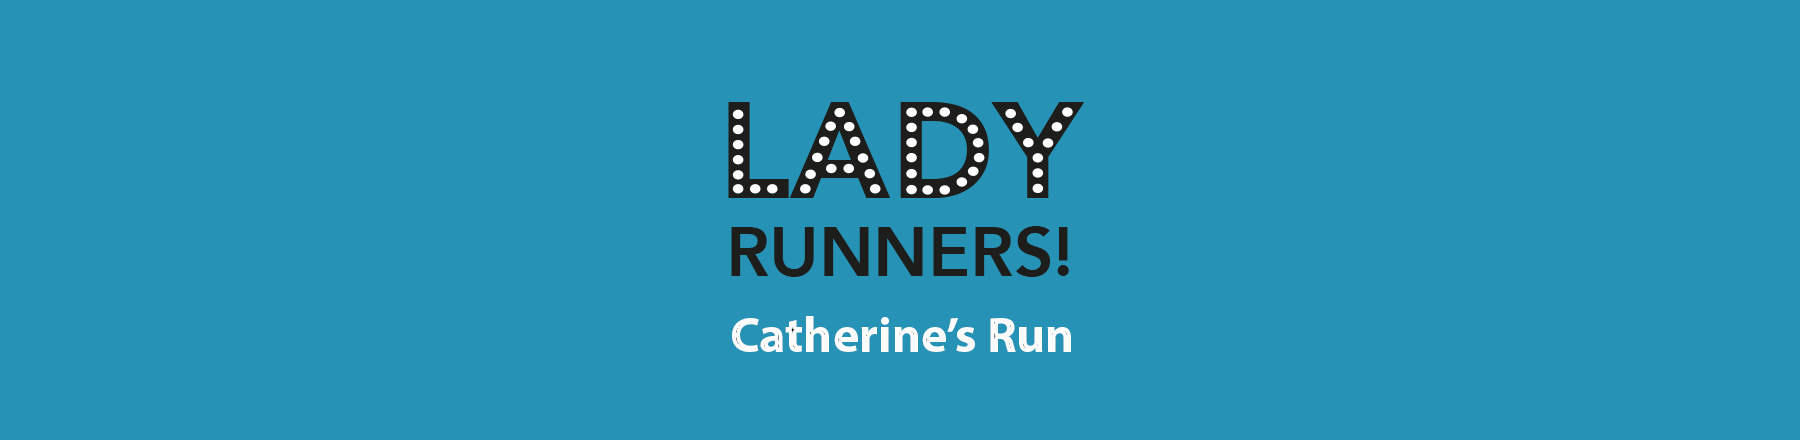 Noverton Lane area - Catherine's Run - Thursday